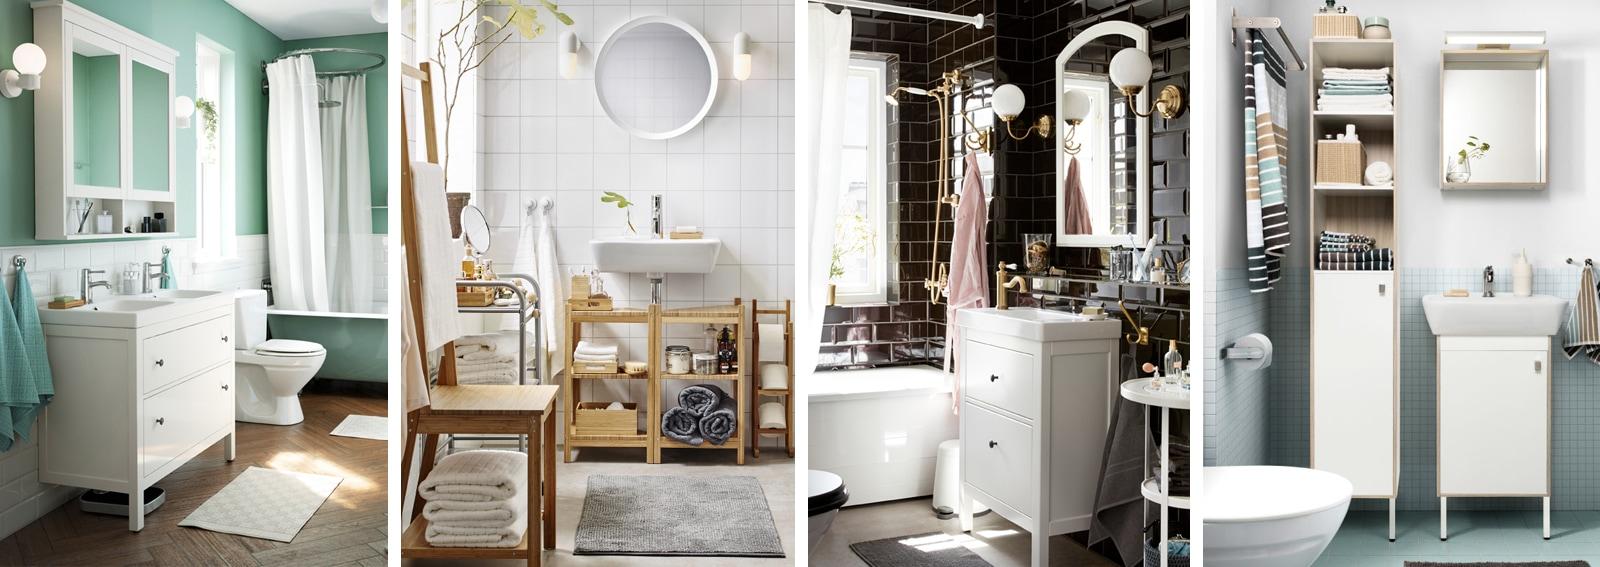 piastrelle bagno ikea ~ Comarg.com = Interior Design ed Eleganti e ...